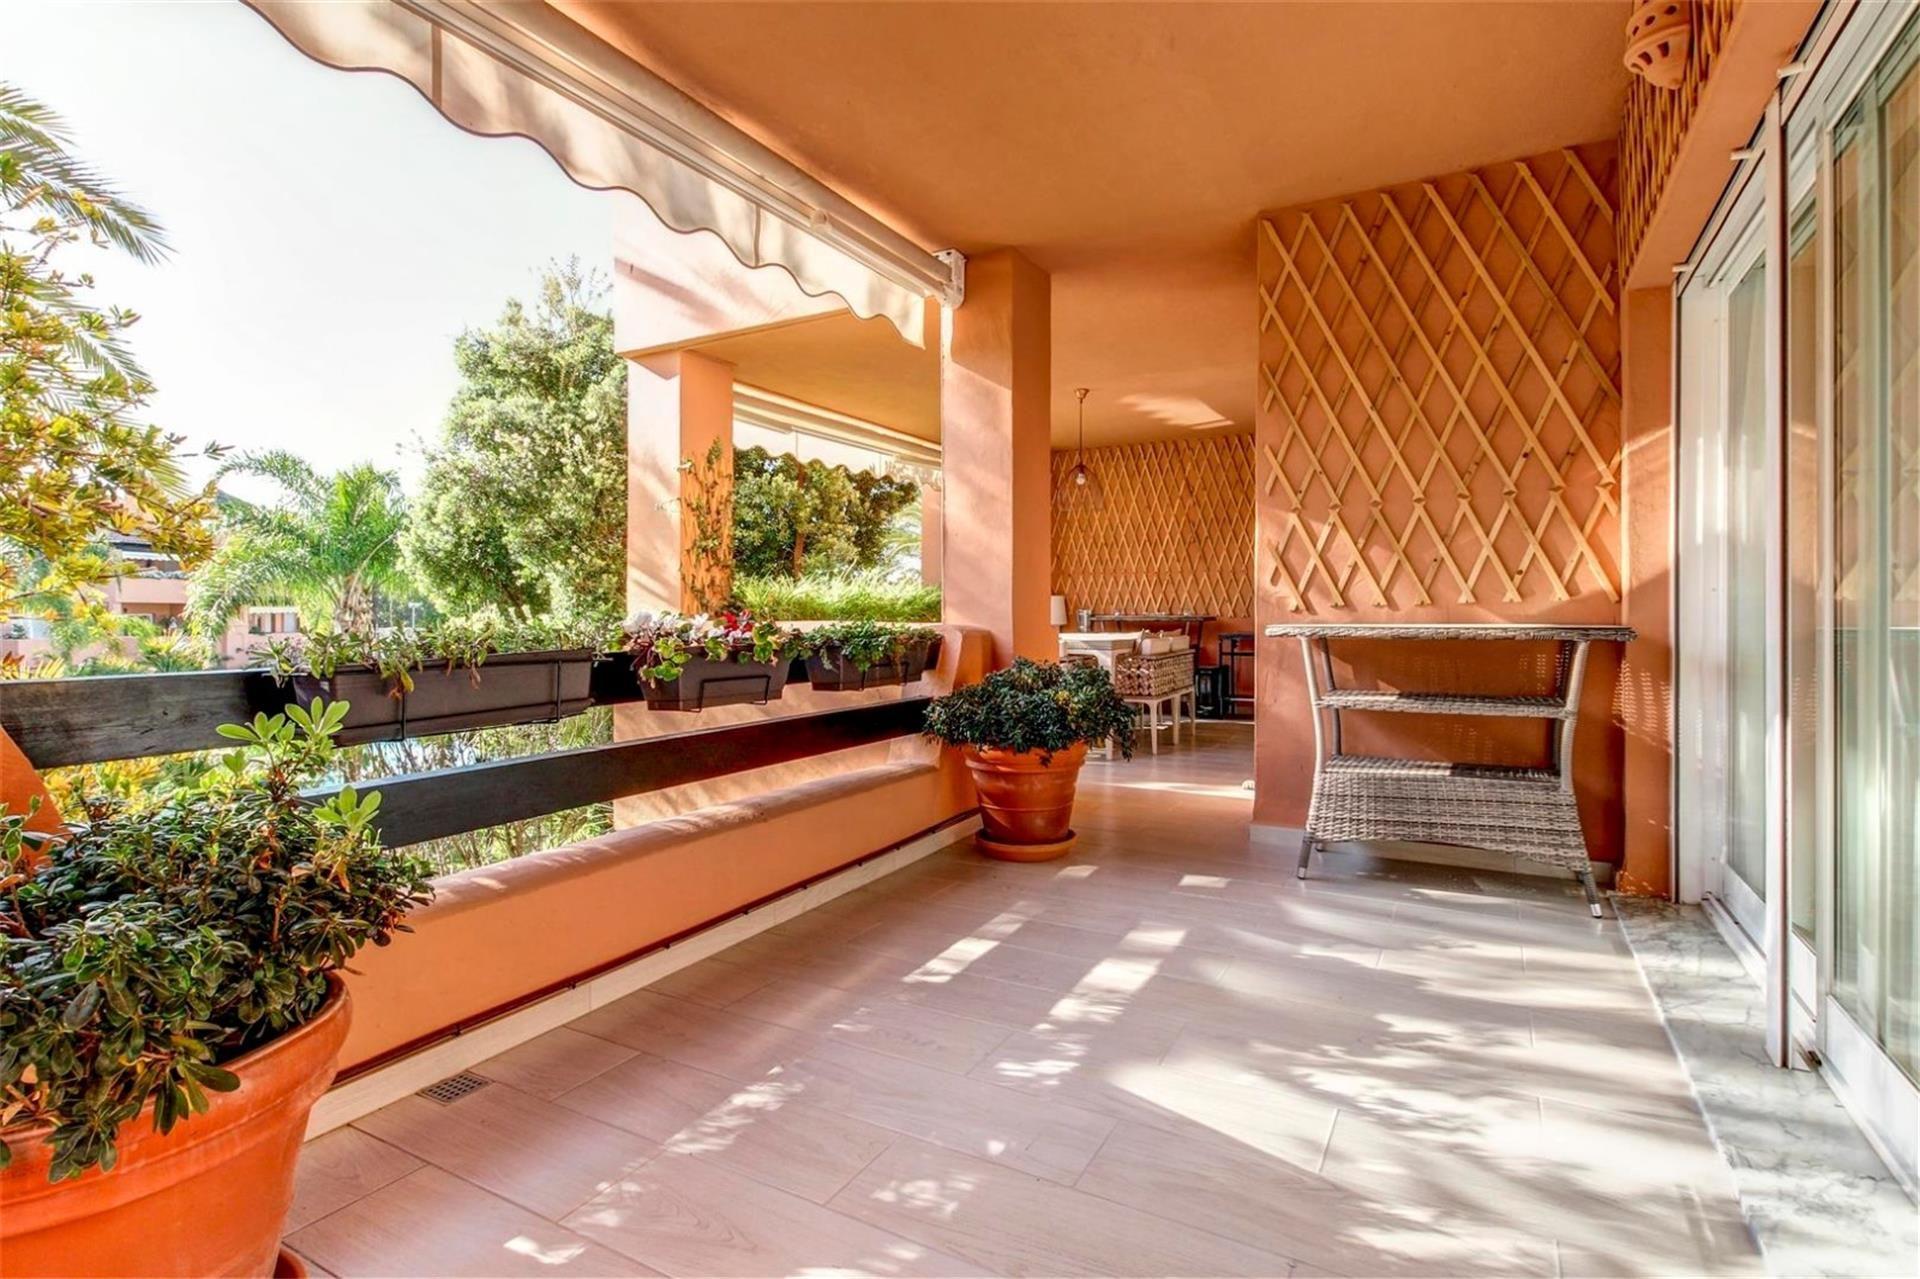 Piso de alquiler en Urbanización Urbanización Alhambra del Golf, ., Paraíso - Atalaya- Benamara (El Paraíso, Málaga)